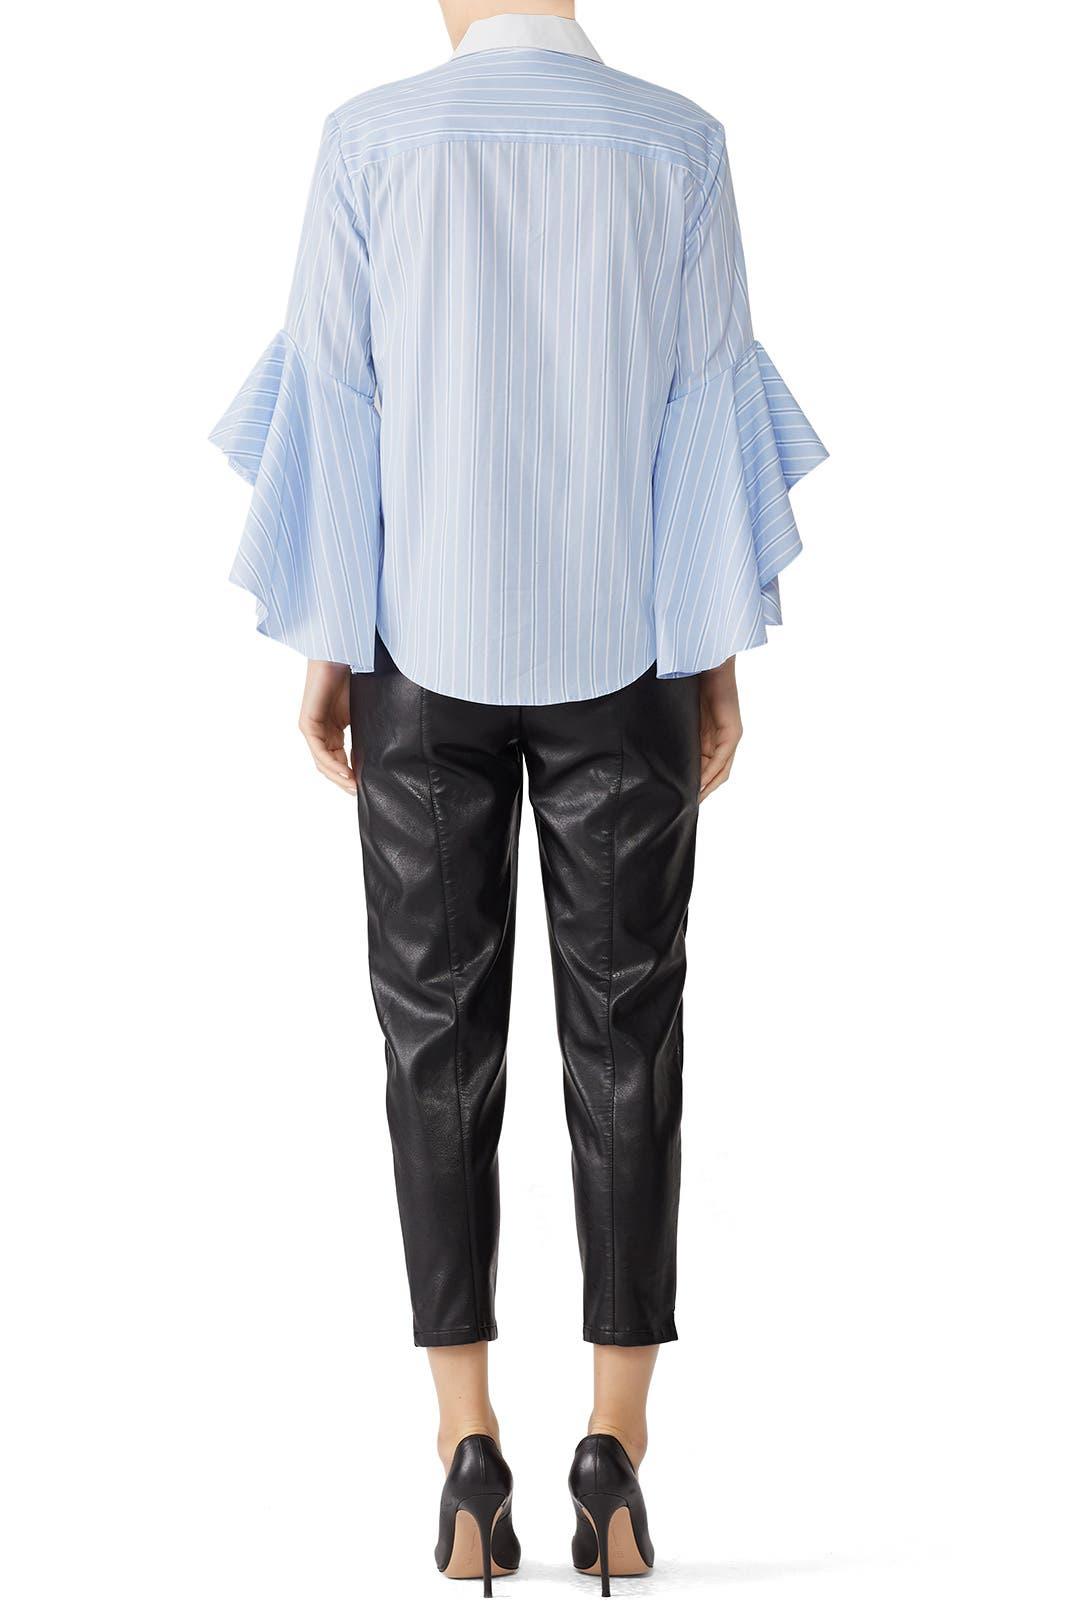 07665498153a95 Stripe Ruffle Sleeve Shirt by Jonathan Simkhai for  65